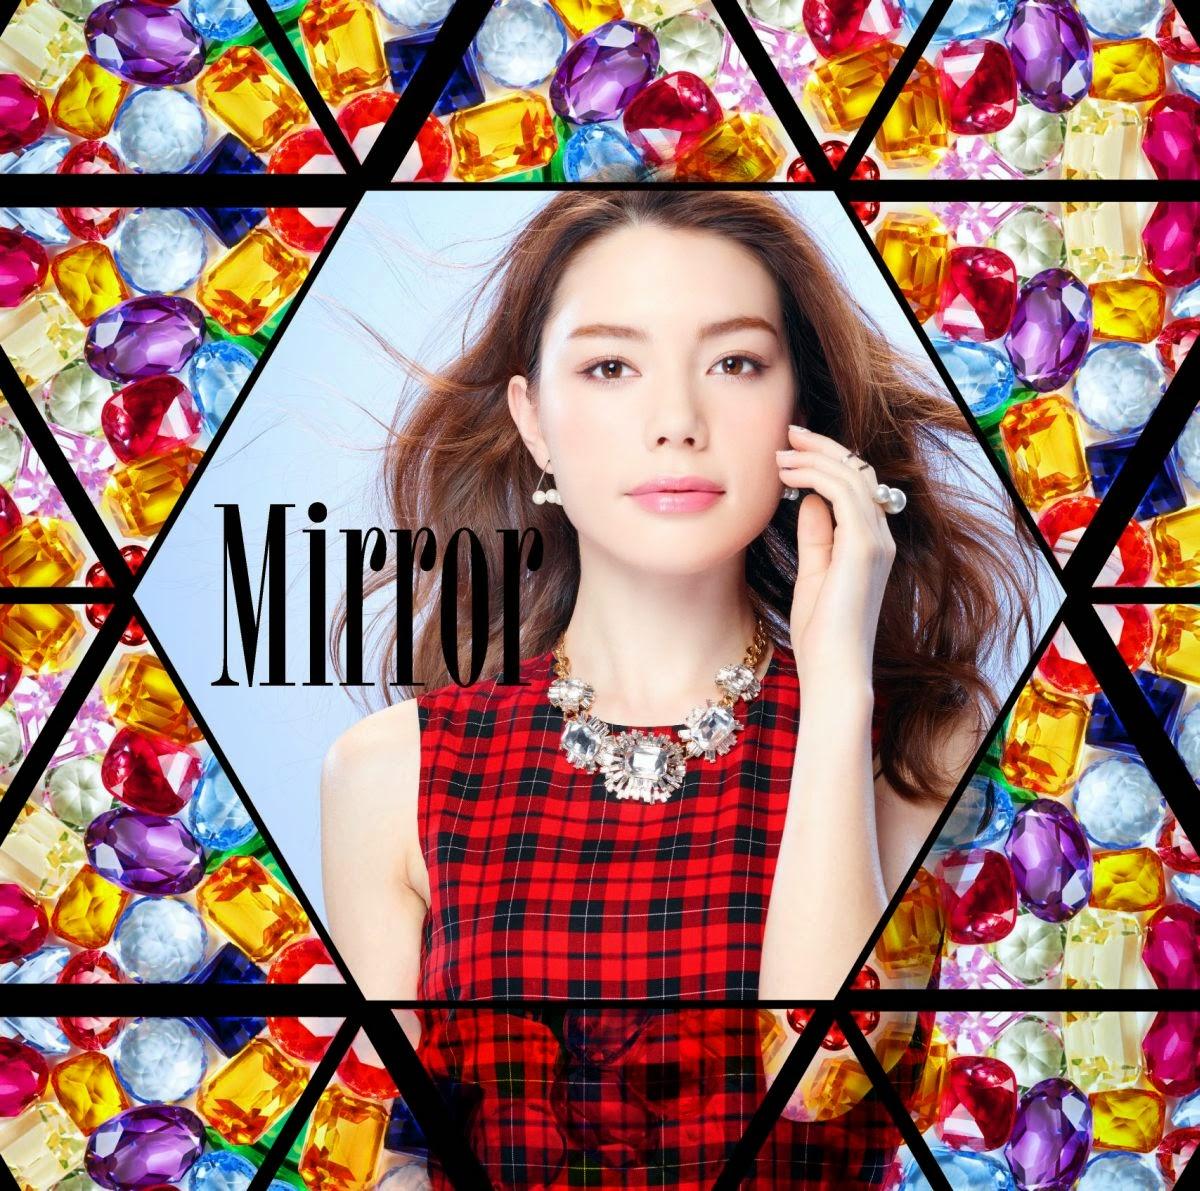 Yasuda Rei 安田レイ Mirror lyrics cover